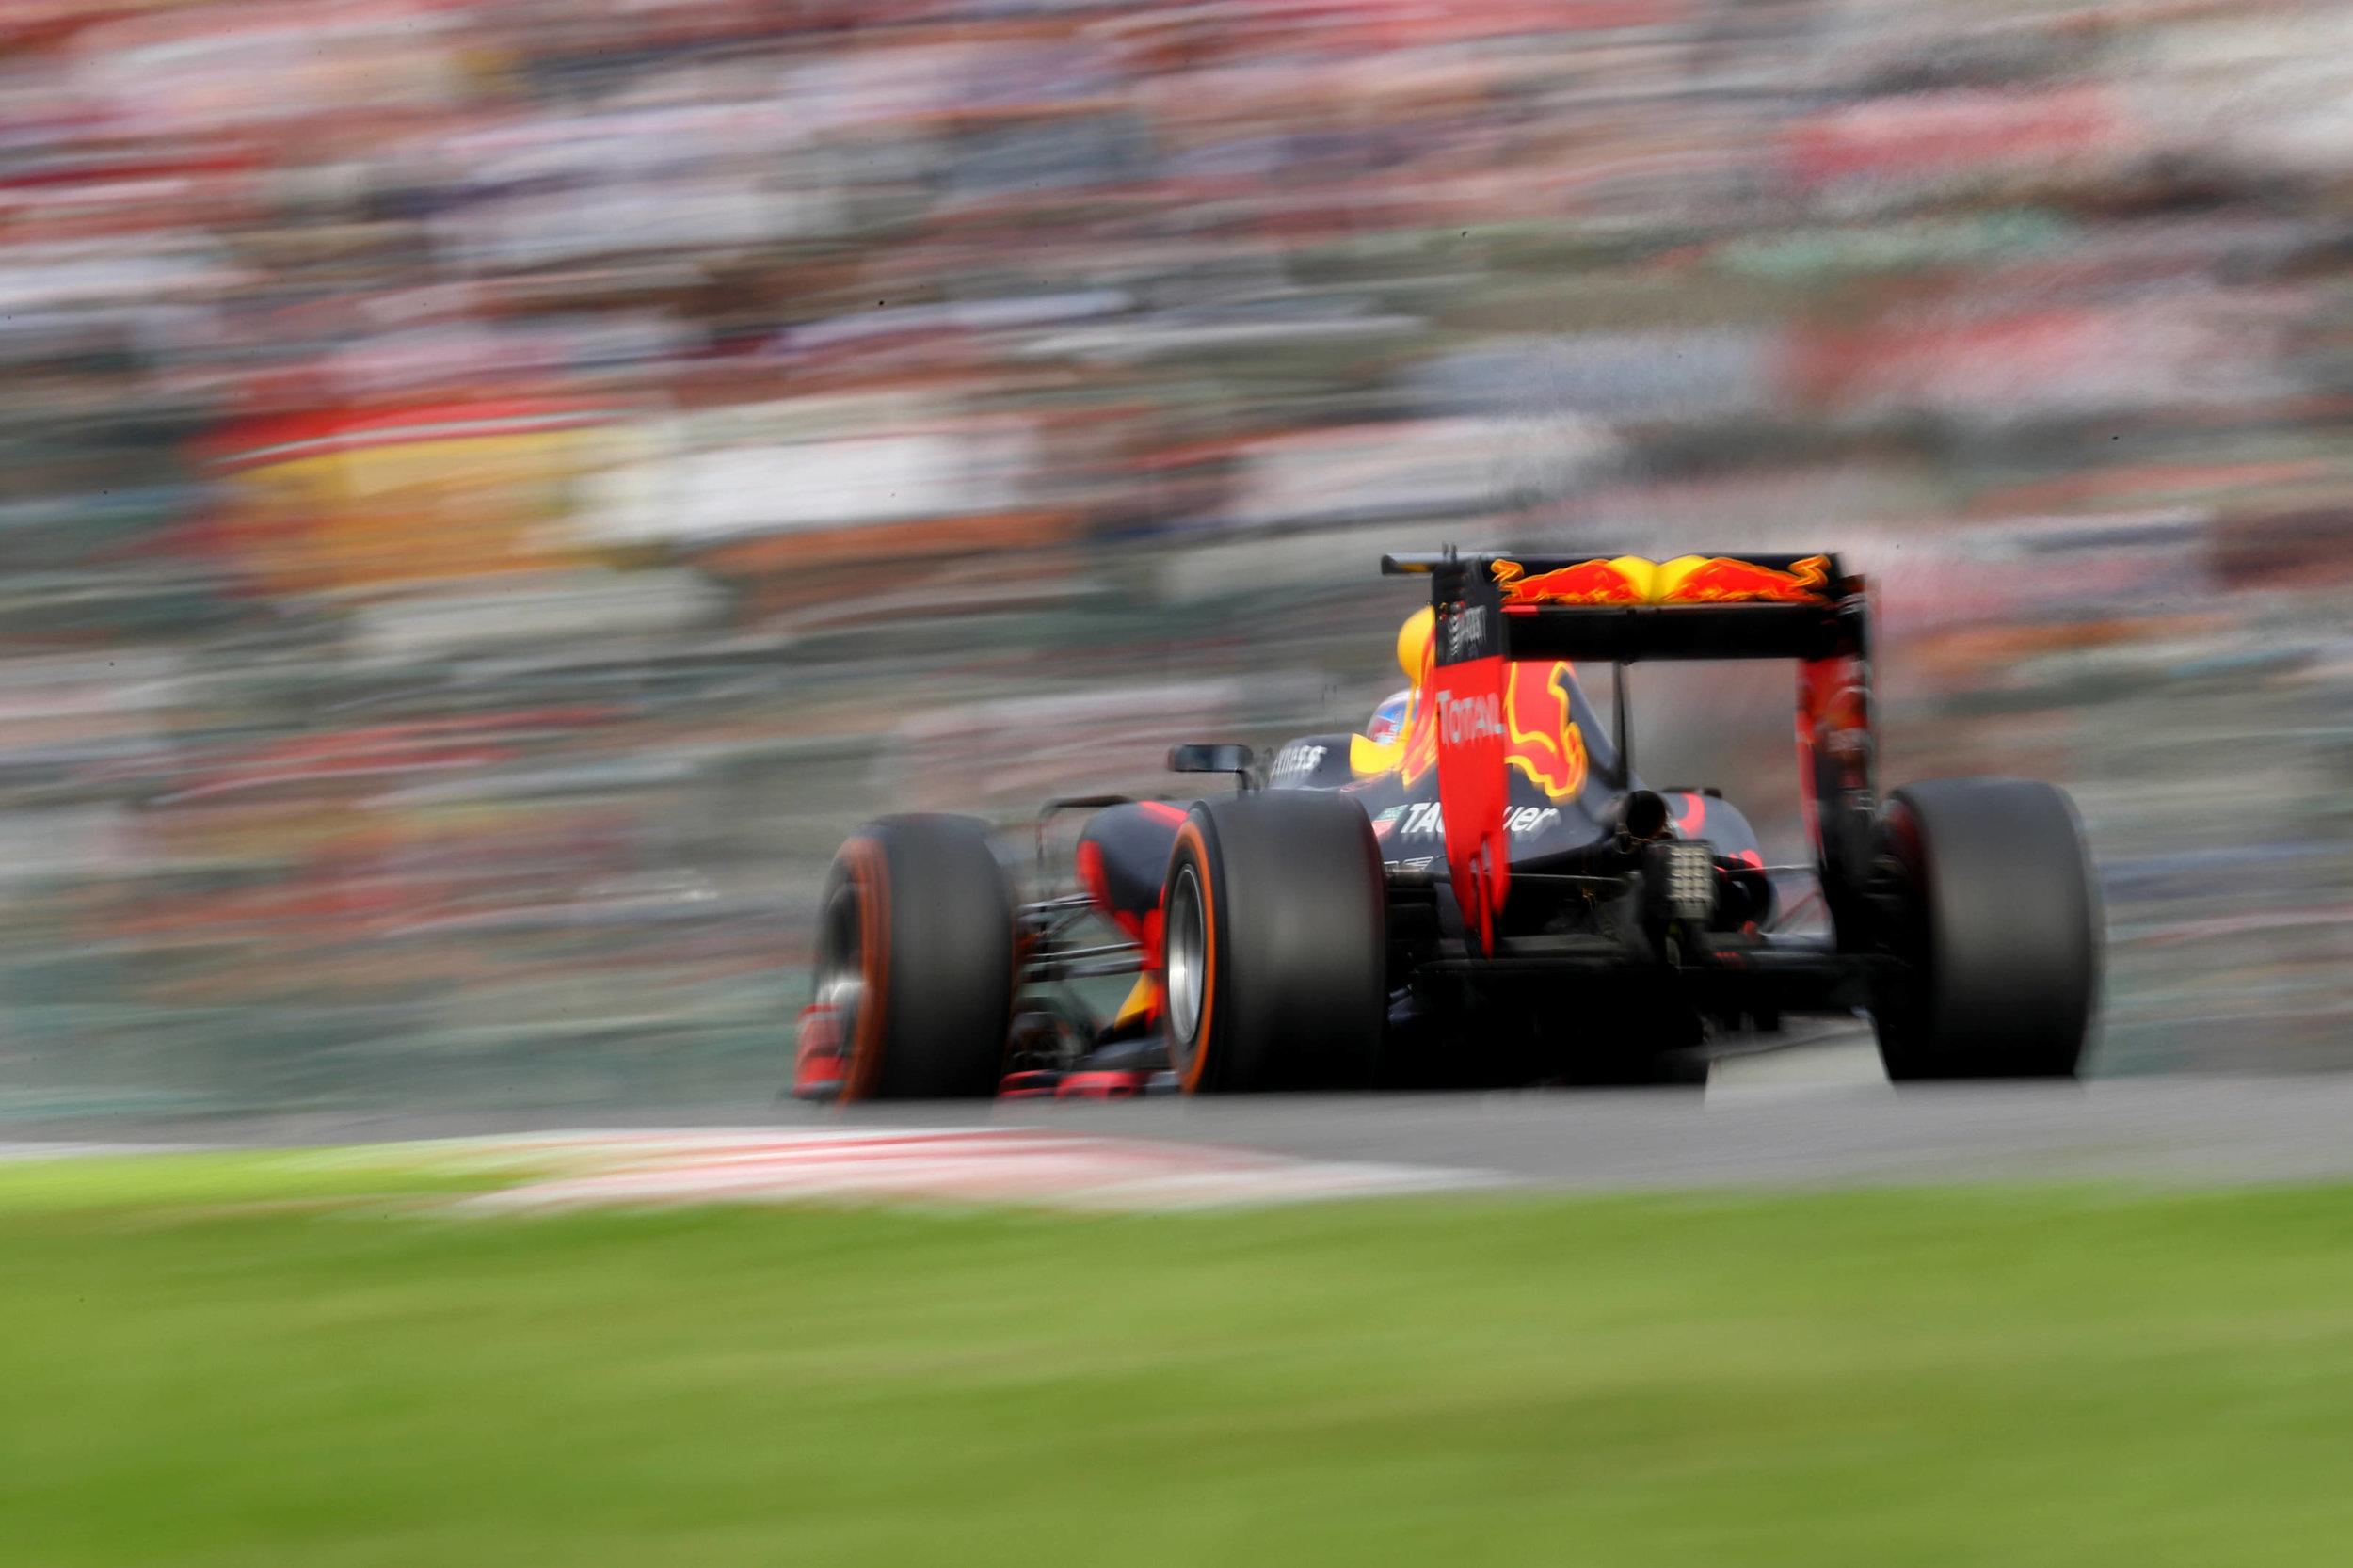 2016 Daniel Ricciardo | Red Bull RB12 | 2016 JapaneseGP P6 2.jpg